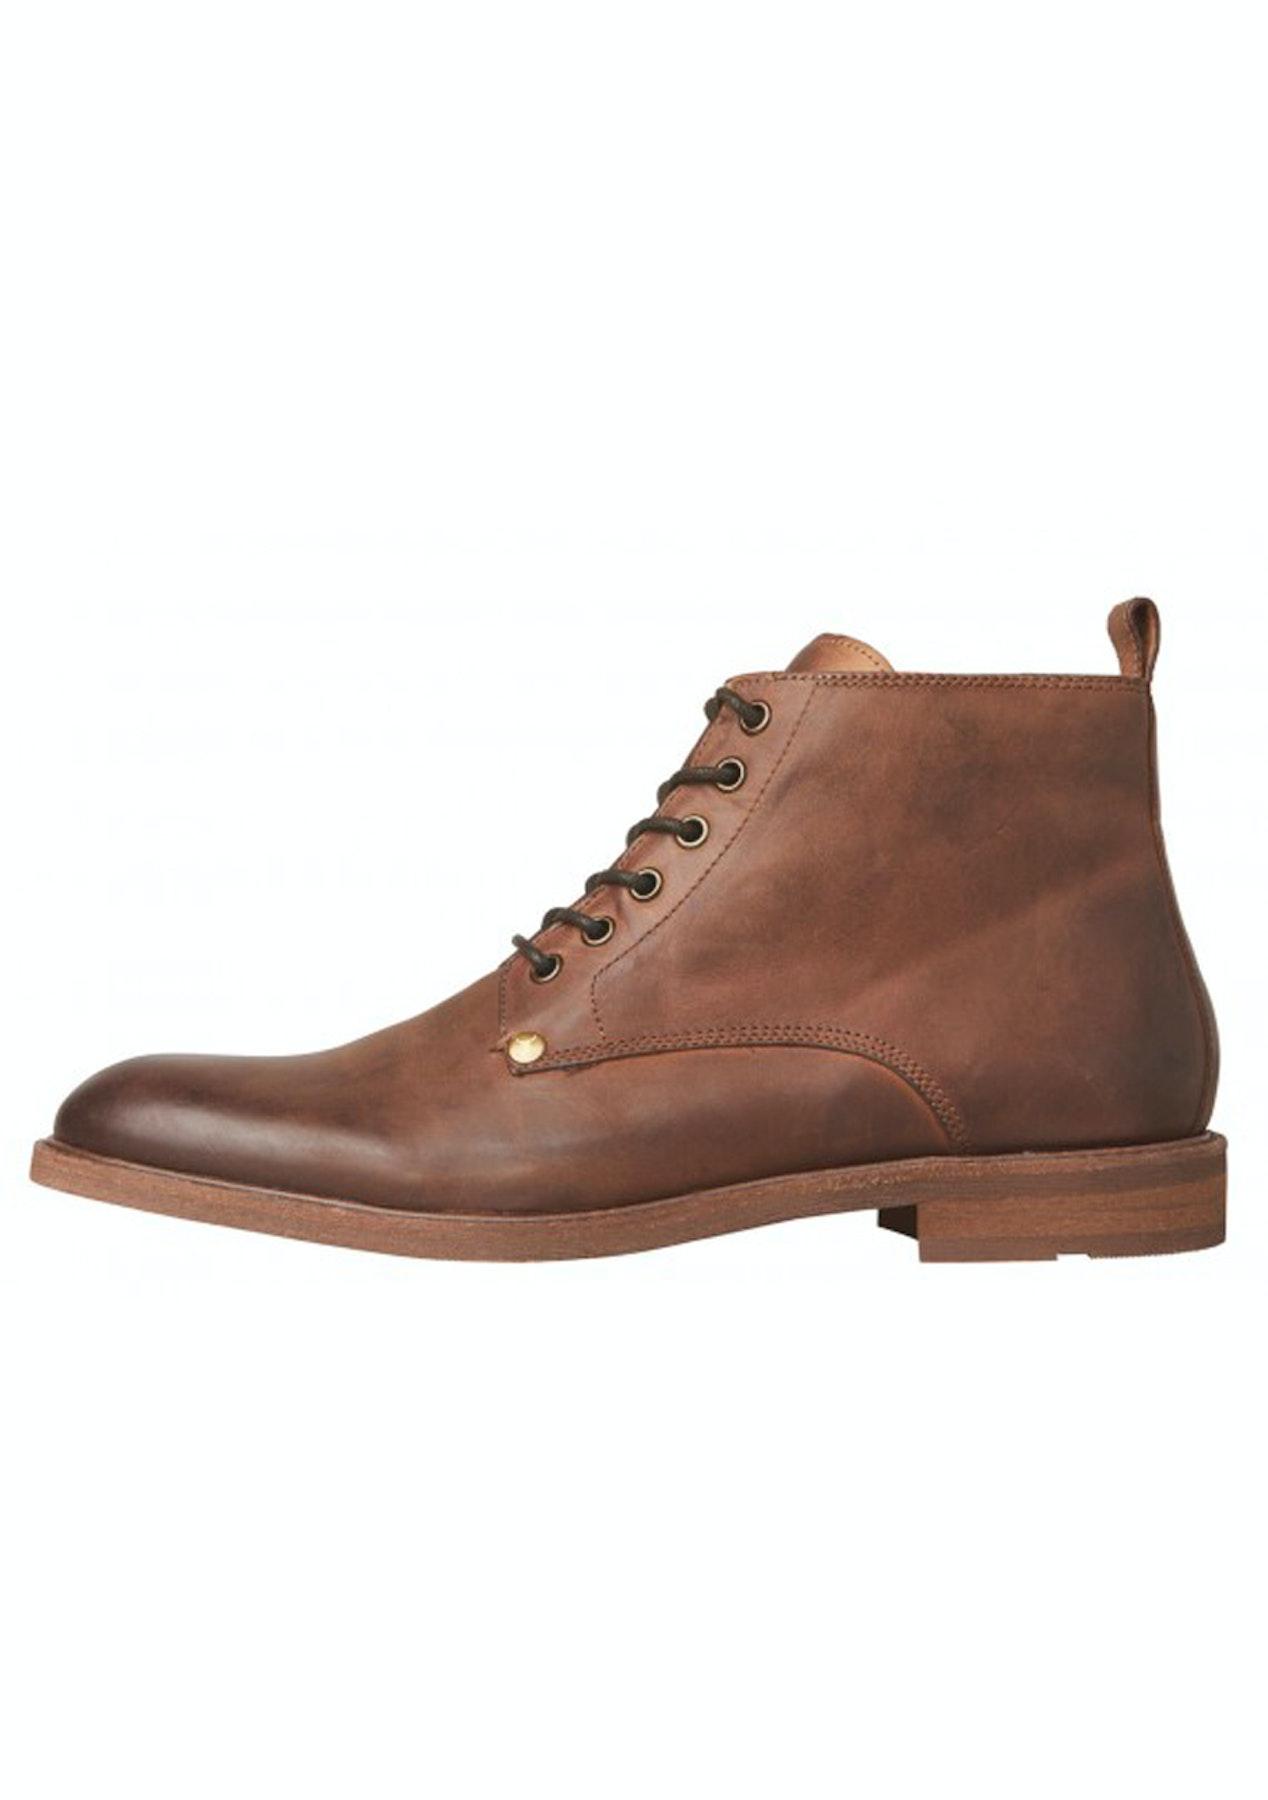 Mens Shoe Clearance Melbourne